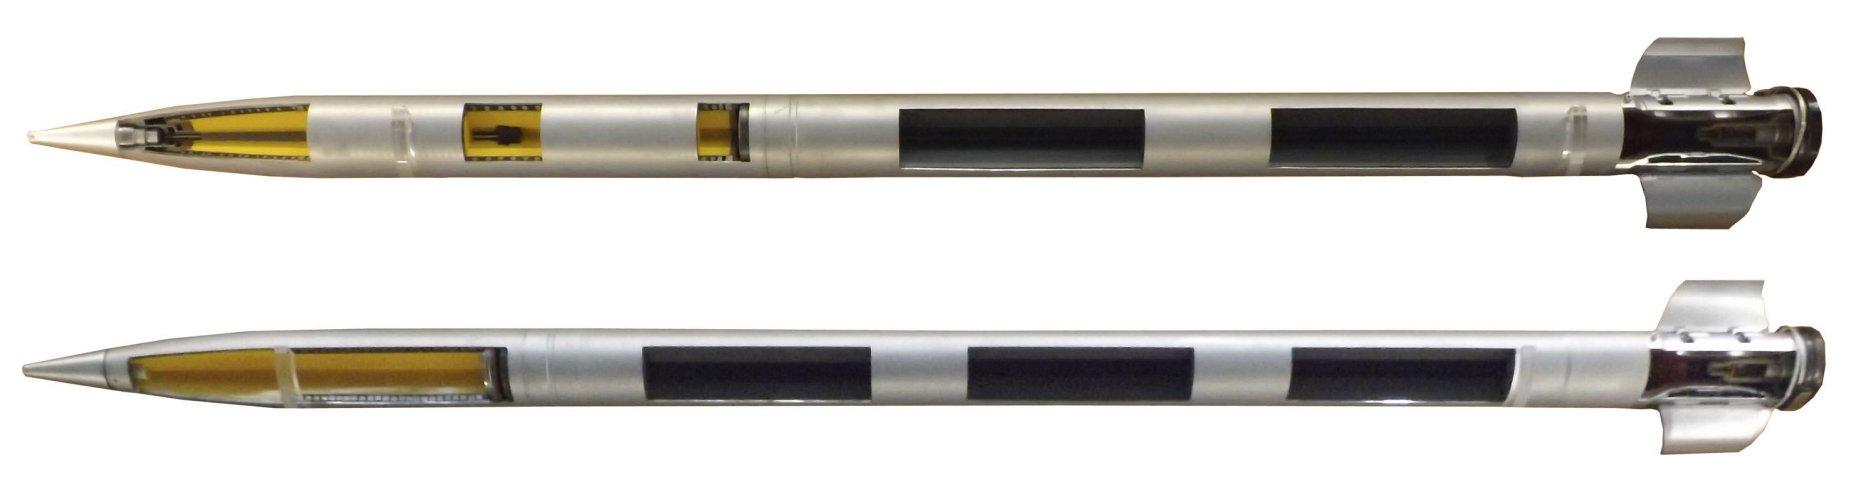 p1730877